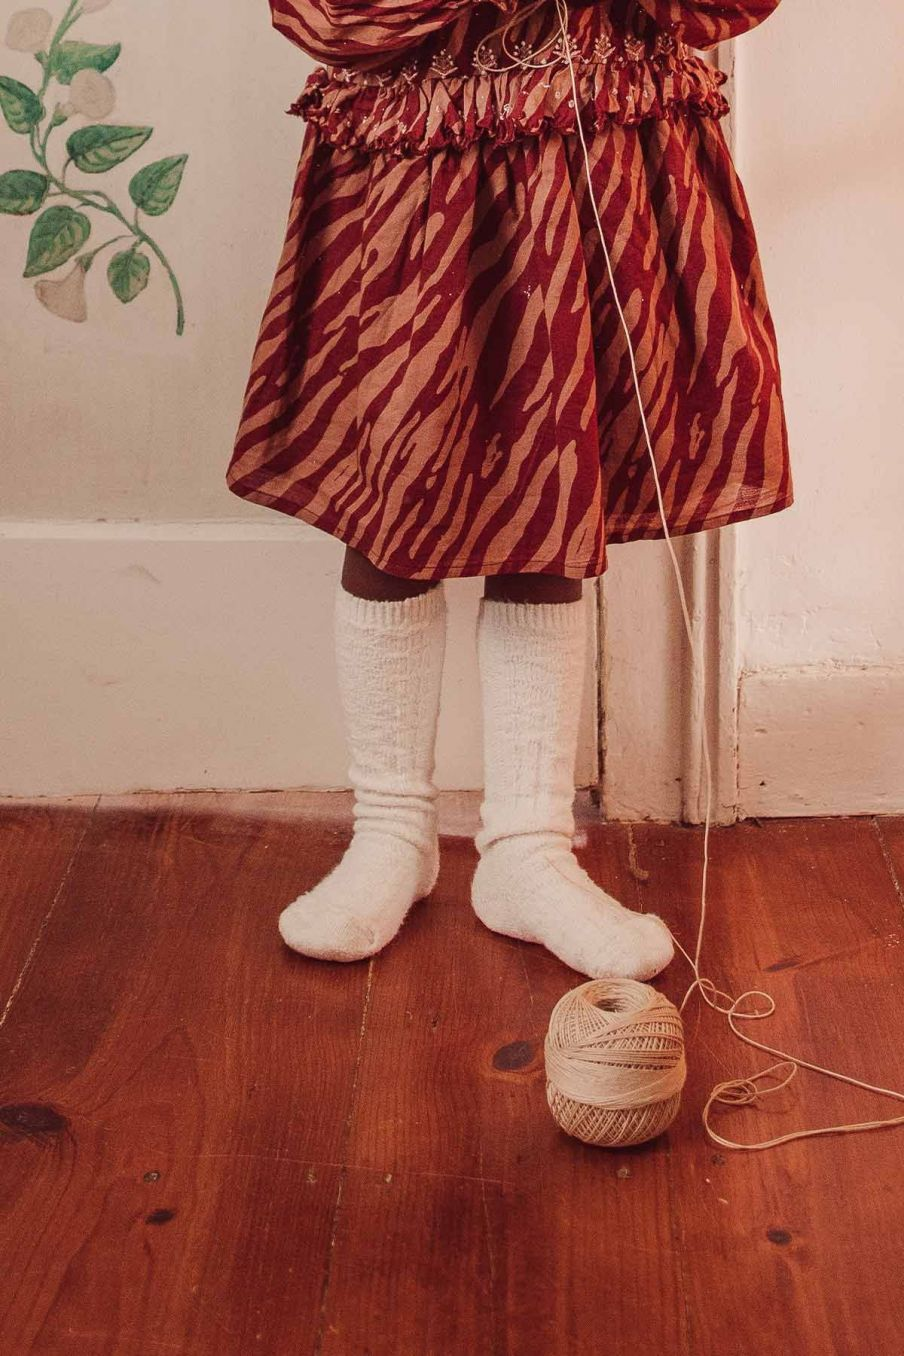 chaussettes bebe fille chouki cream - louise misha